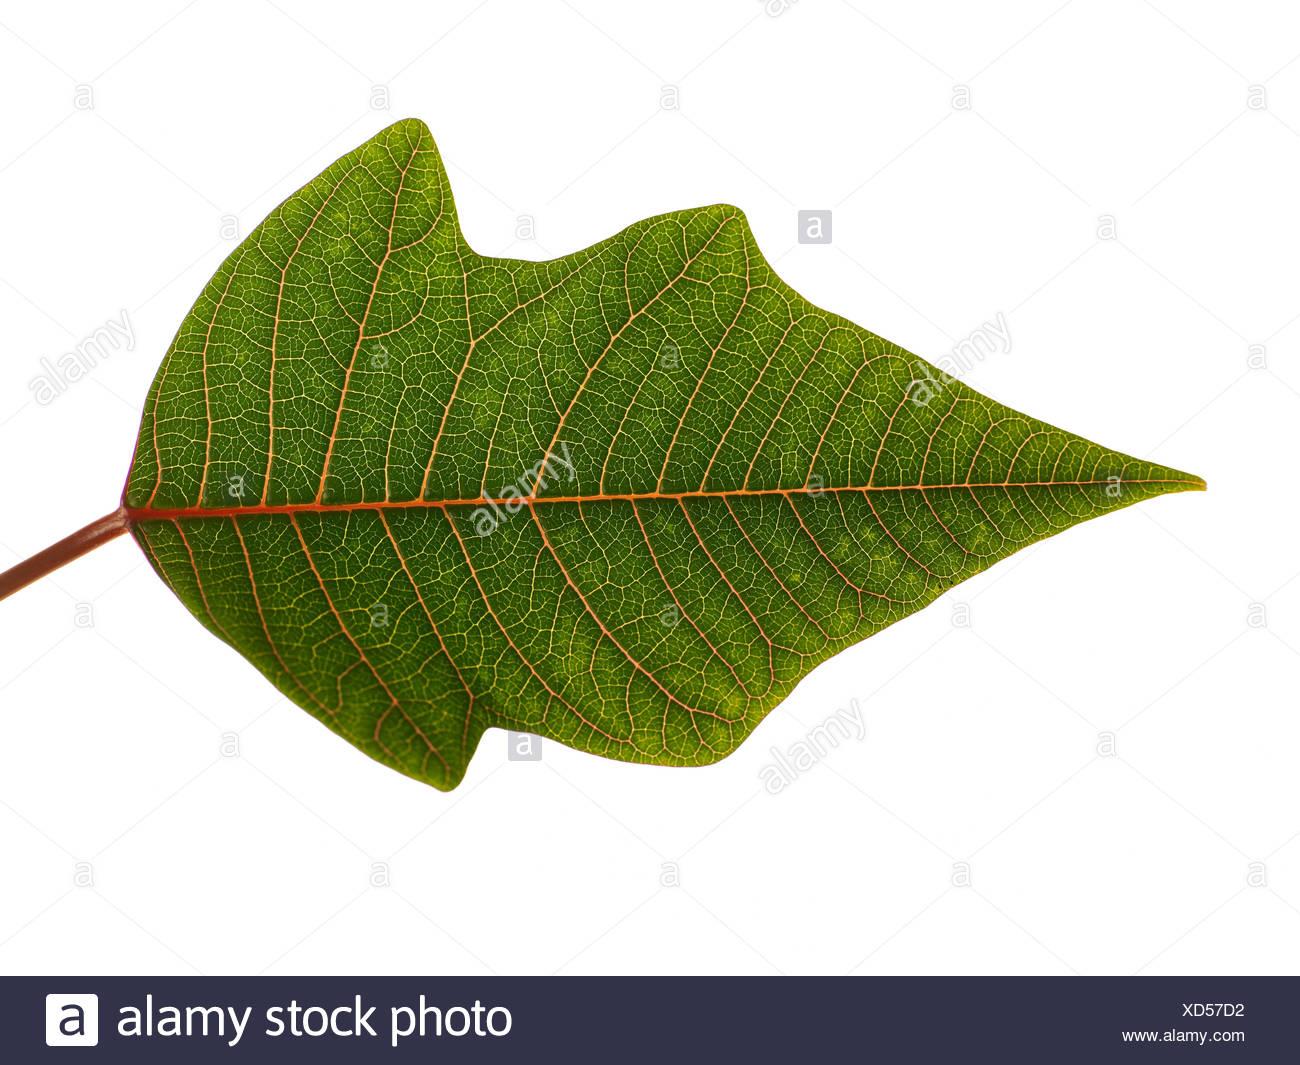 Studio Shot Of A Green Leaf - Stock Image